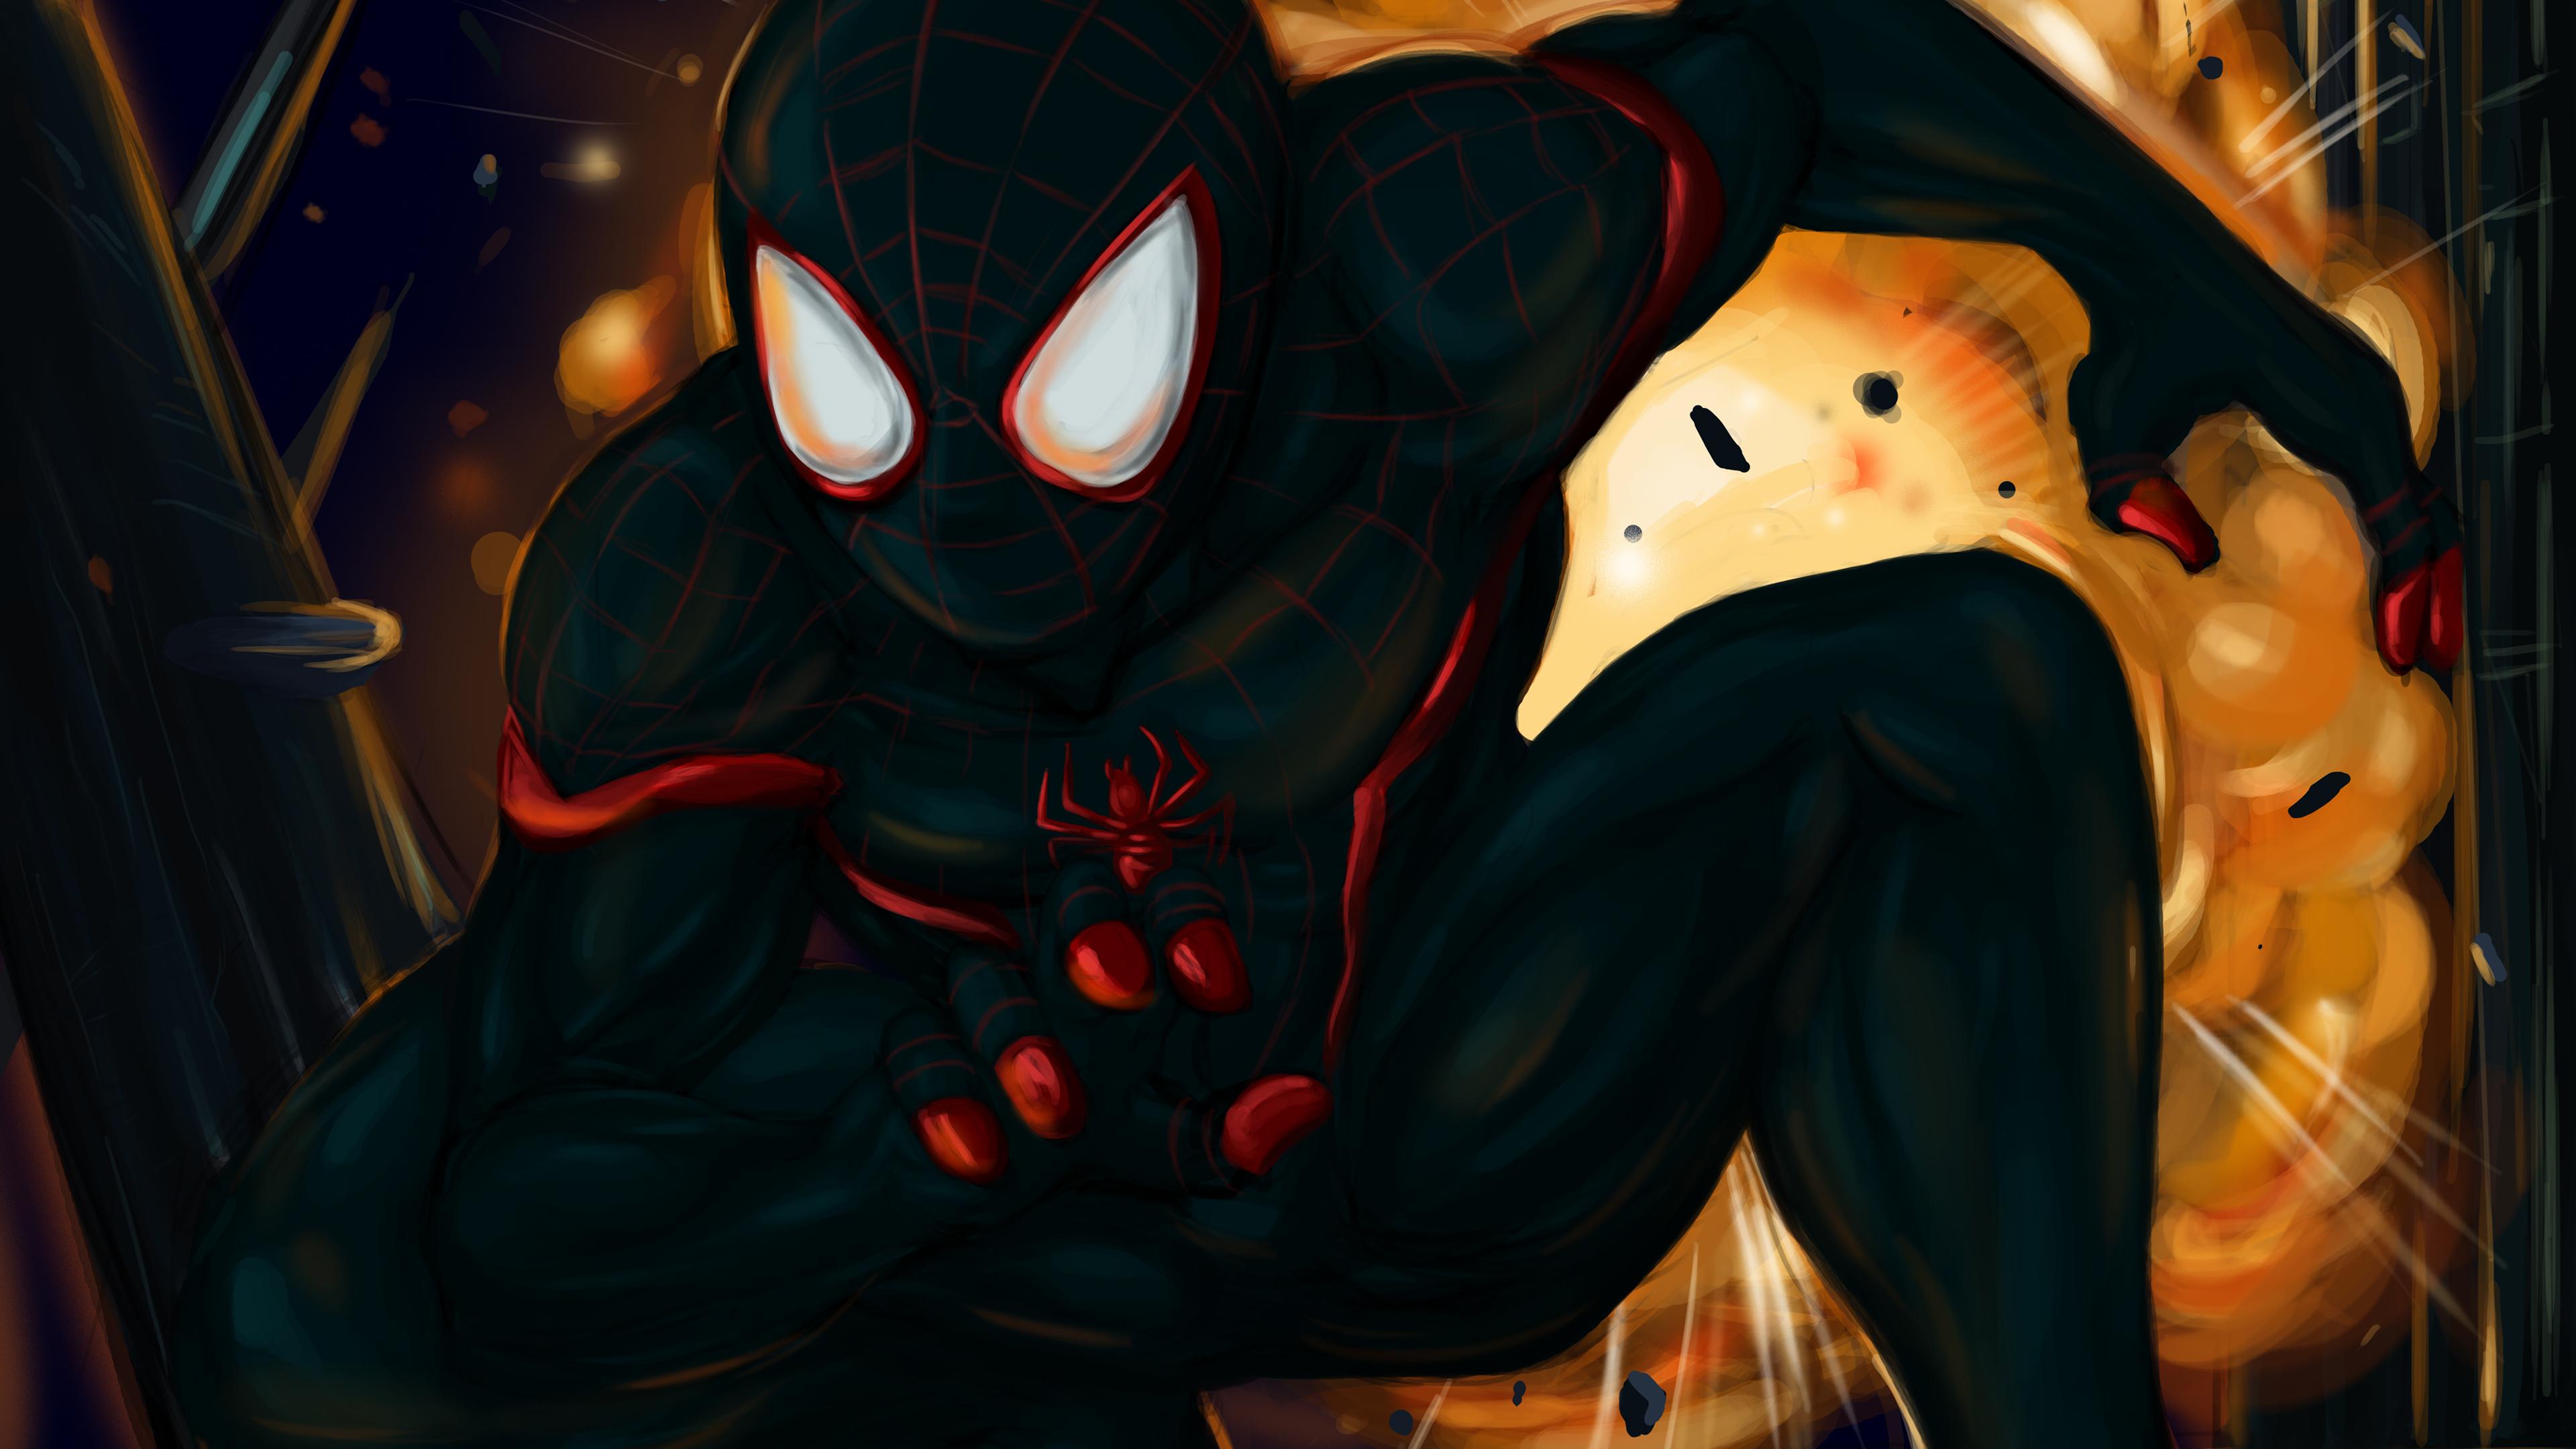 Wallpaper 4k Black Spiderman 4k Art 4k Wallpapers Art